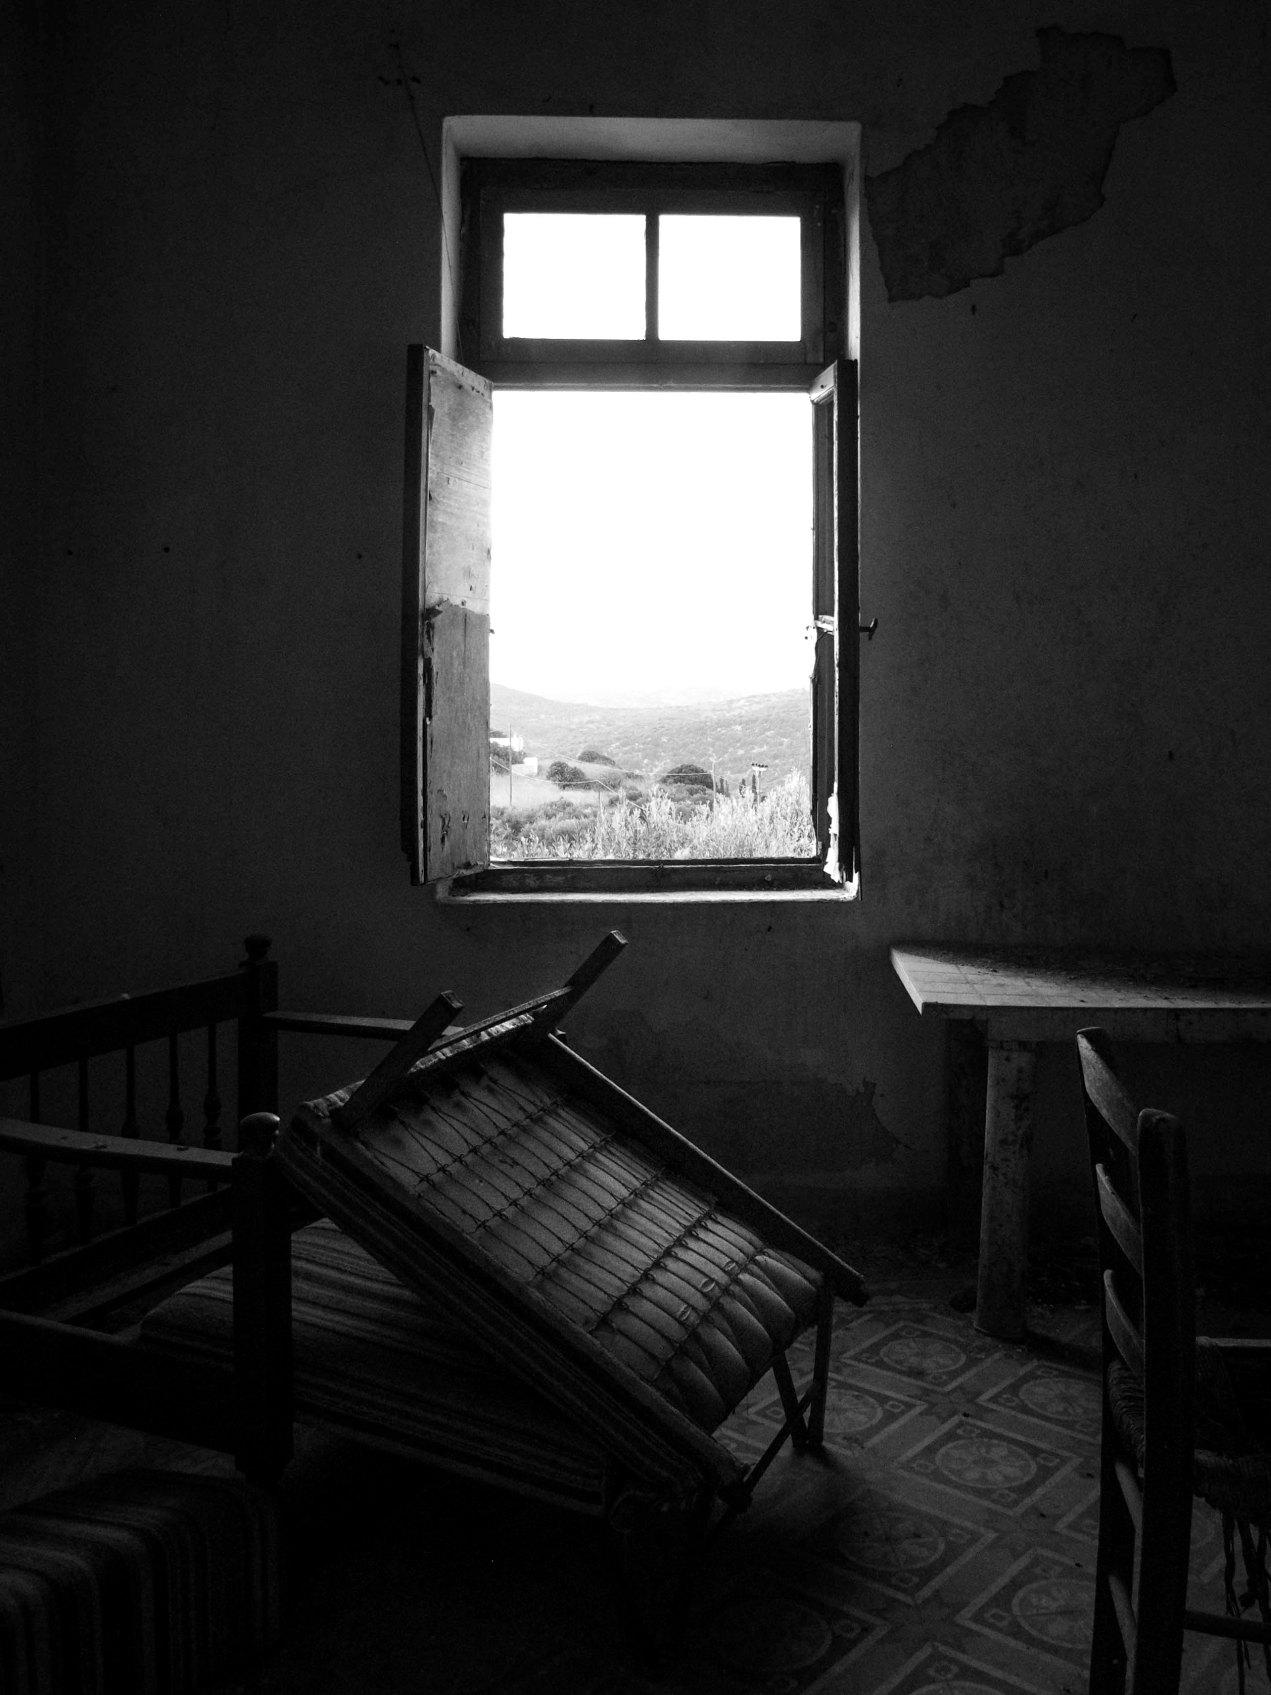 Scène de ménage, Kithera, gildalliere, 2015